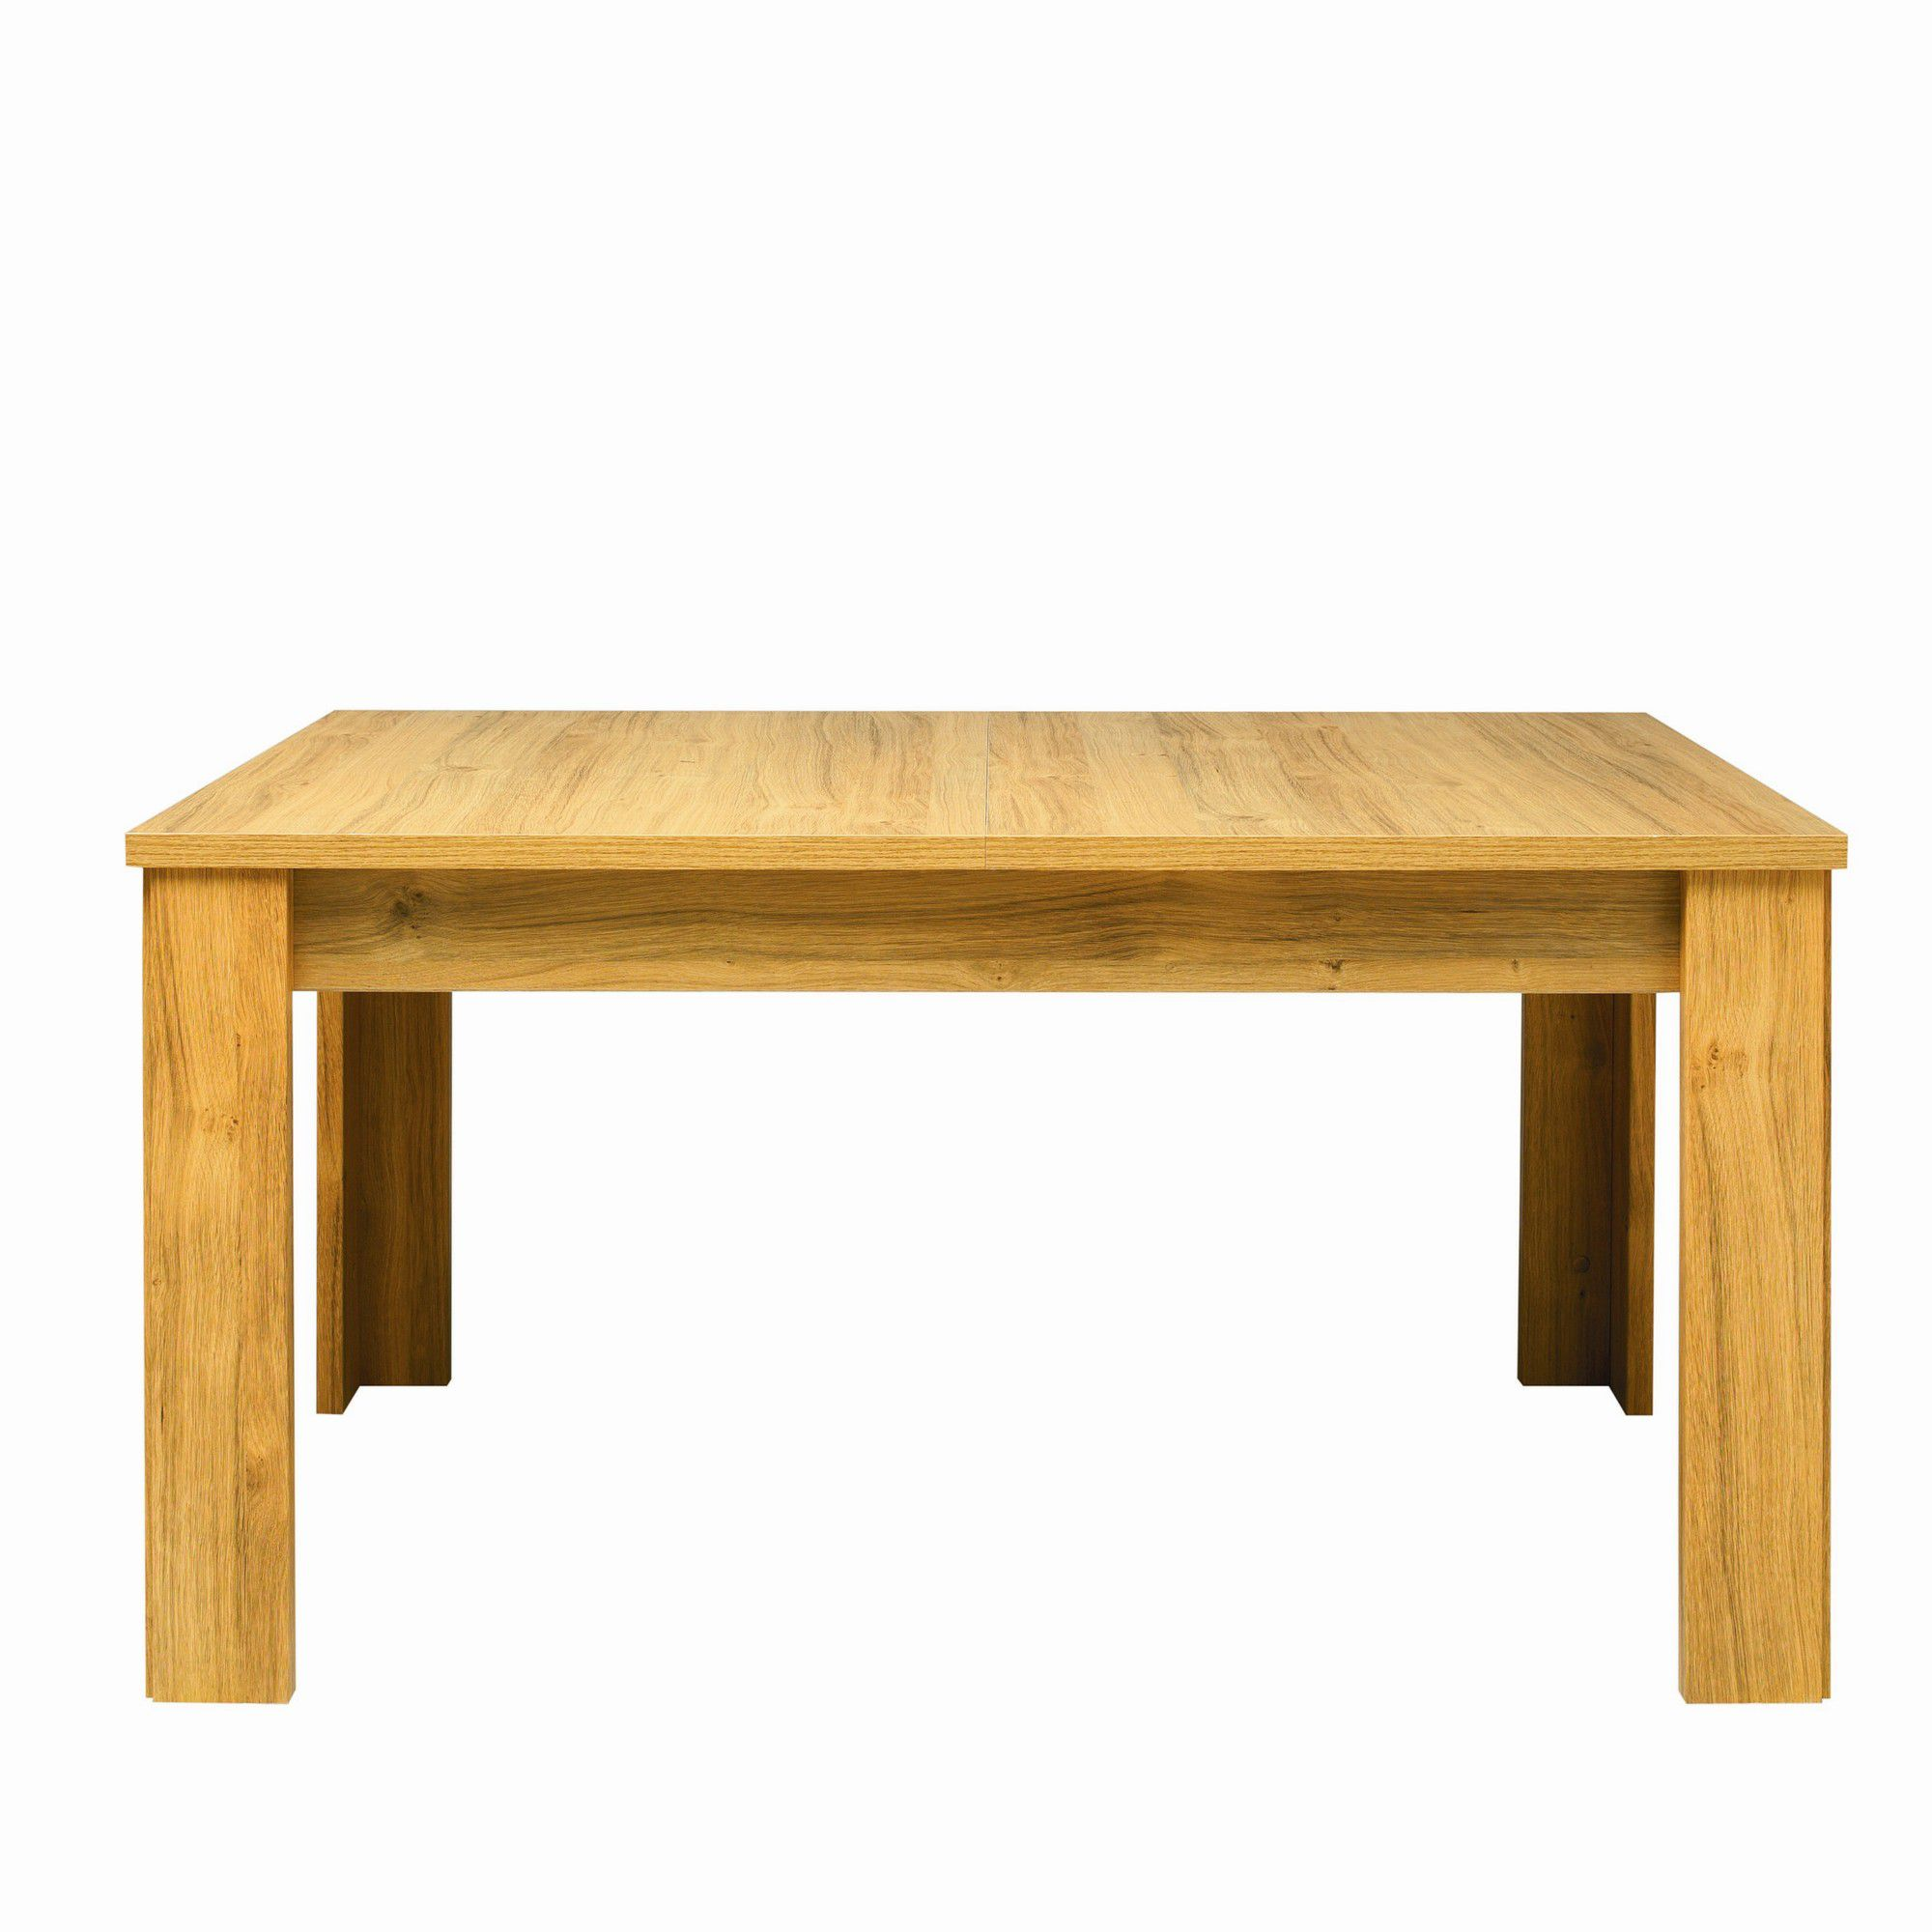 Extending Table 187 Tesco Extending Tables : 535 6366PI1000015MNwid2000amphei2000 from extendingtable.co.uk size 2000 x 2000 jpeg 201kB